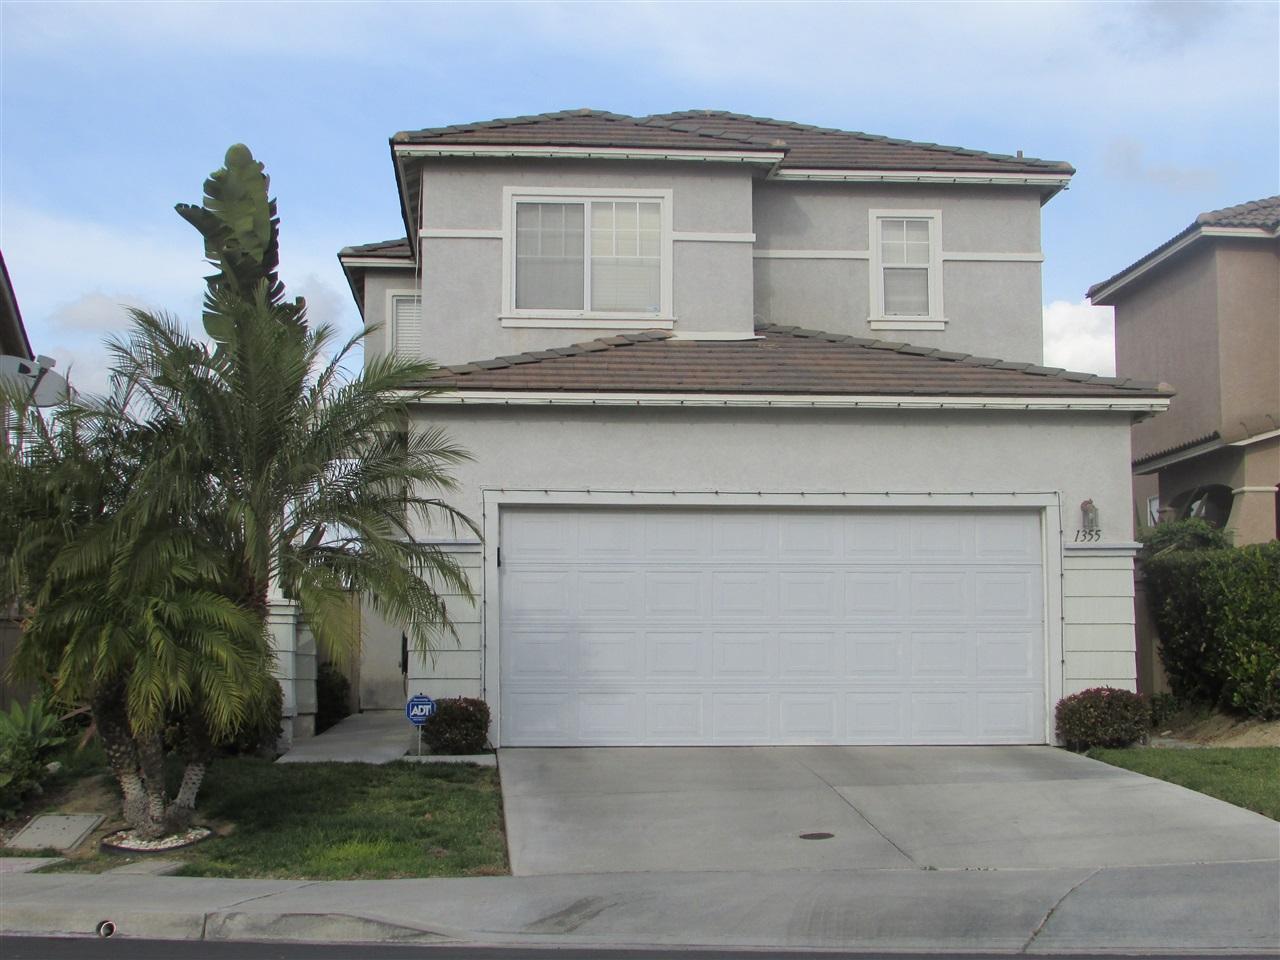 1355 Woodville Ave, Chula Vista, CA